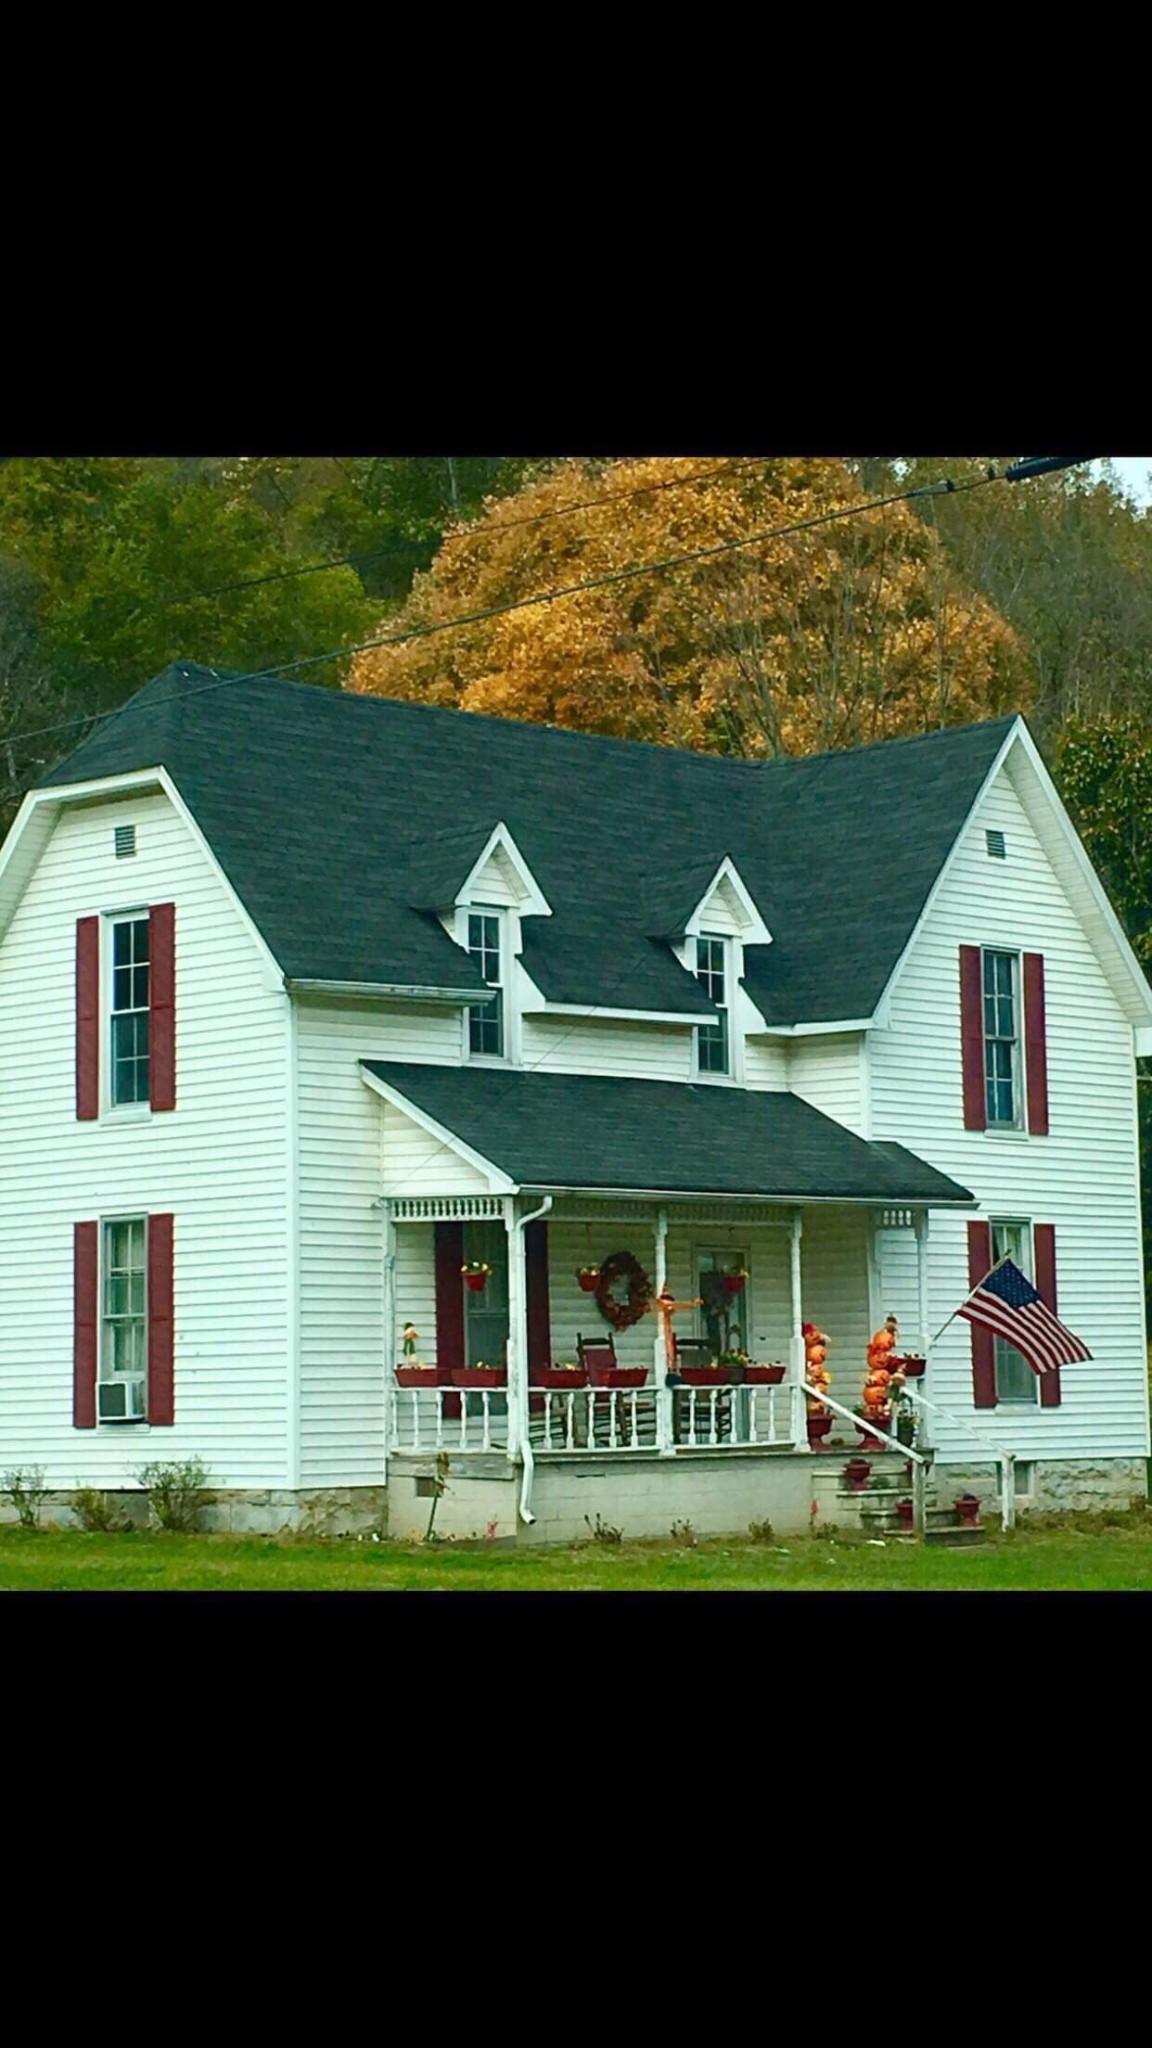 102 Cortner Rd., Normandy, TN 37360 - Normandy, TN real estate listing